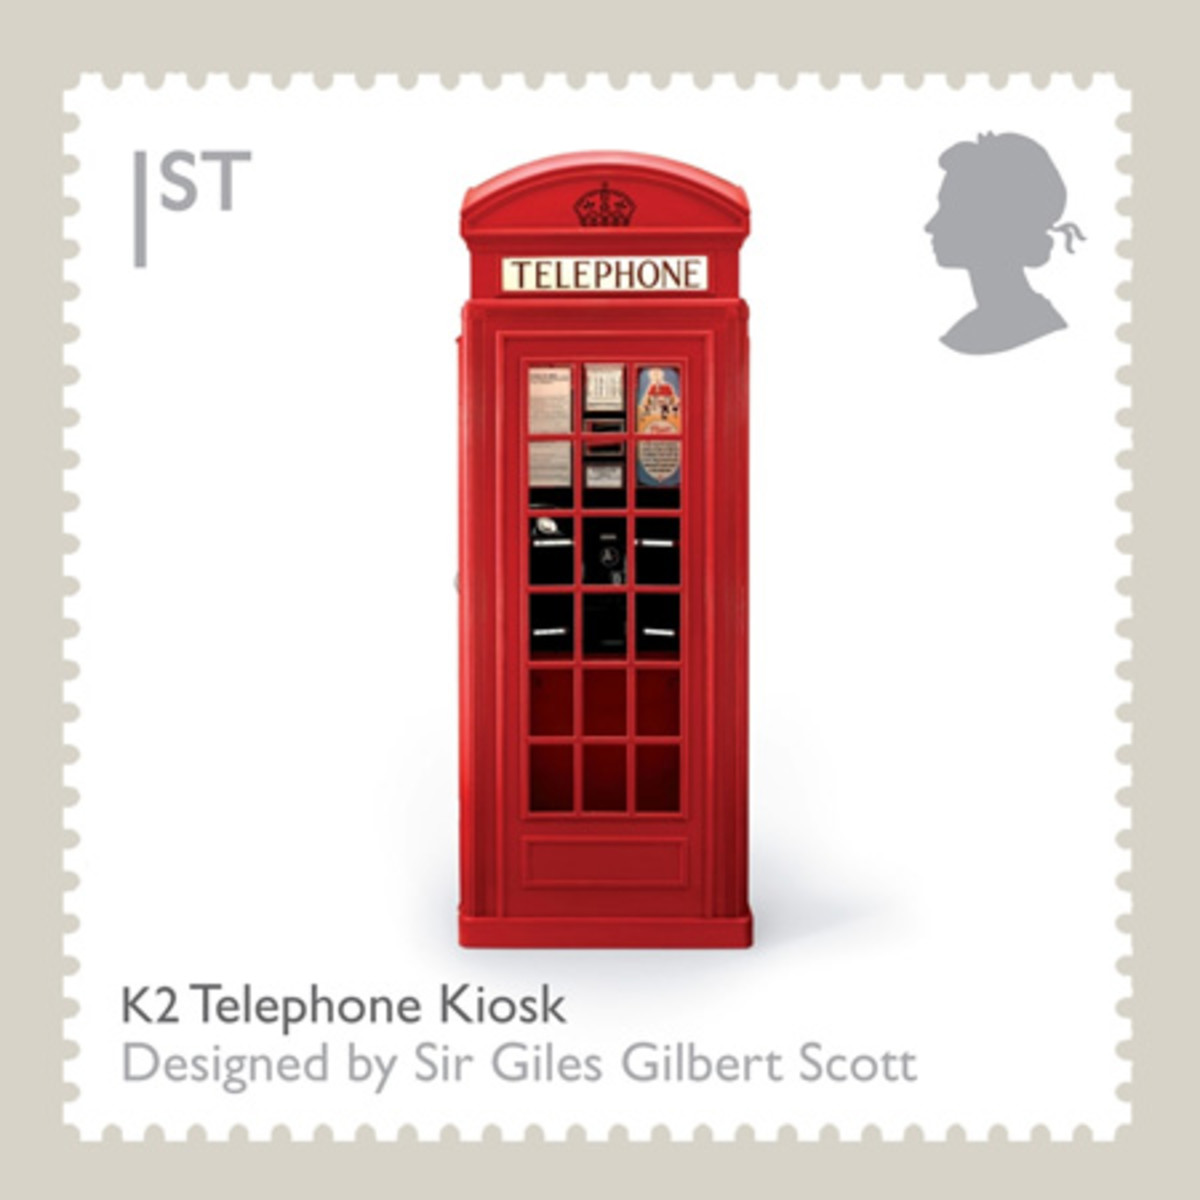 Iconic British Phone Box on a British Postage Stamp